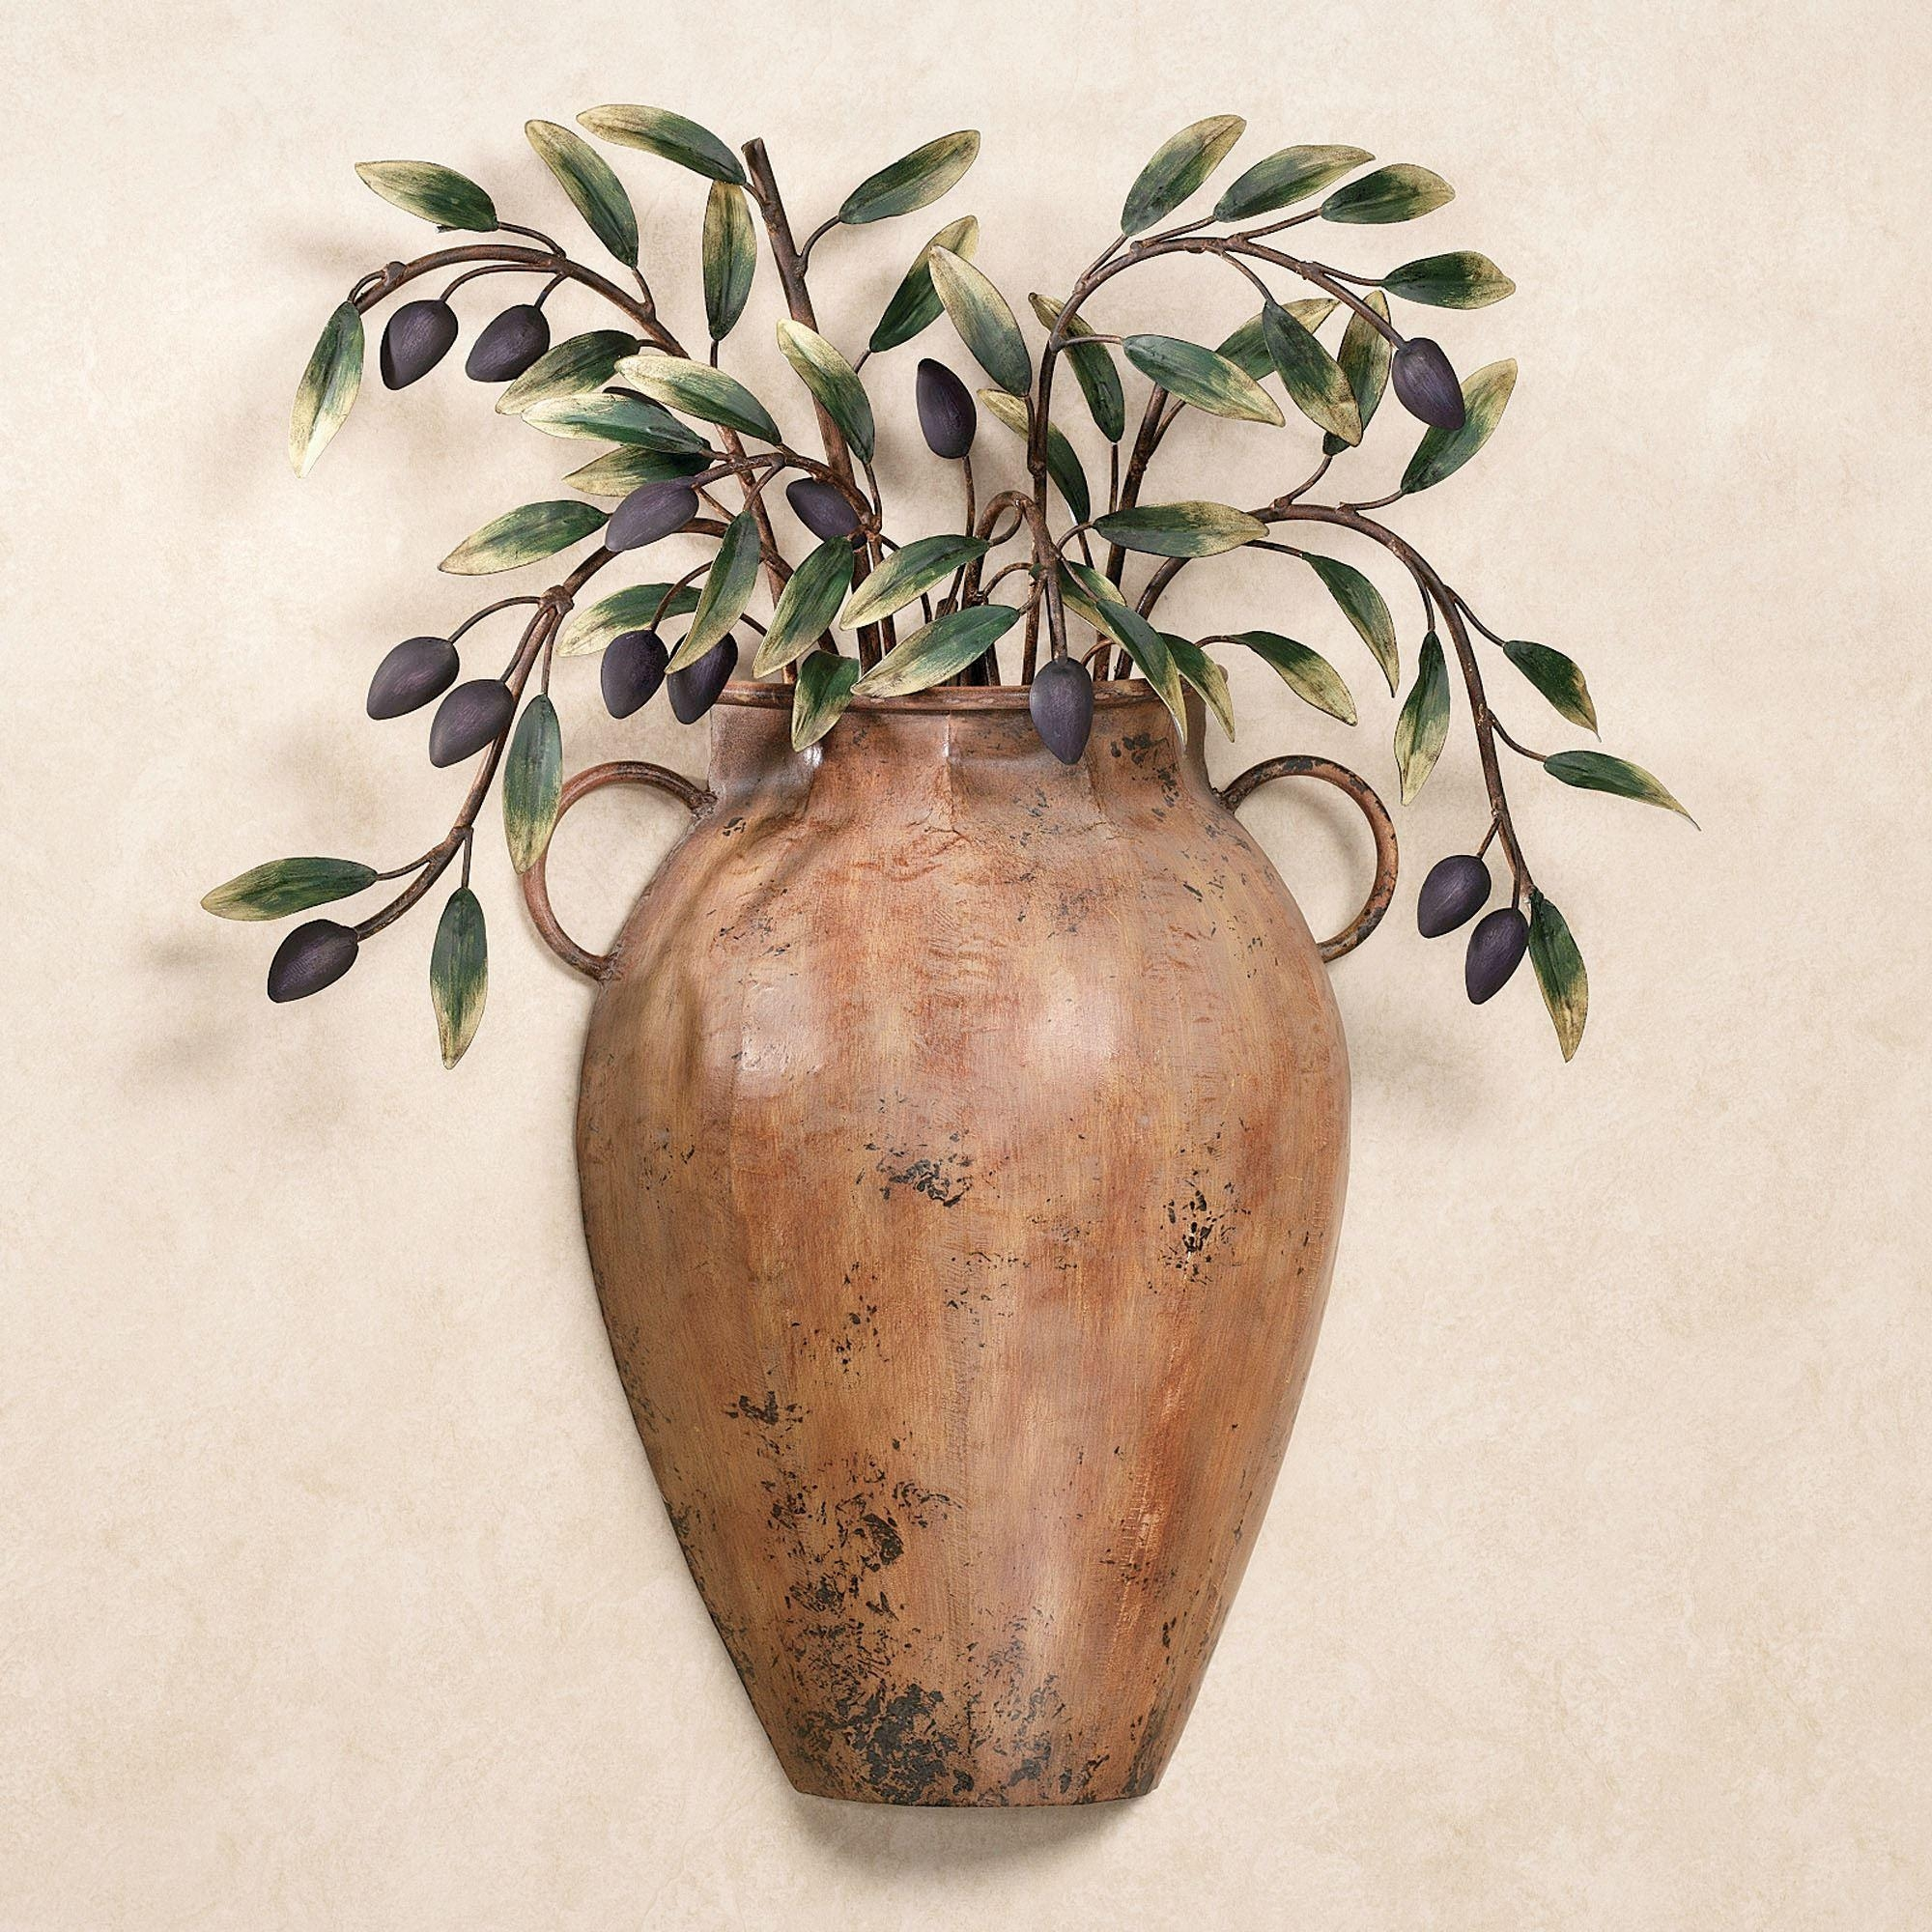 Tuscan Italian Art | Touch Of Class Regarding Italian Ceramic Outdoor Wall Art (View 3 of 20)